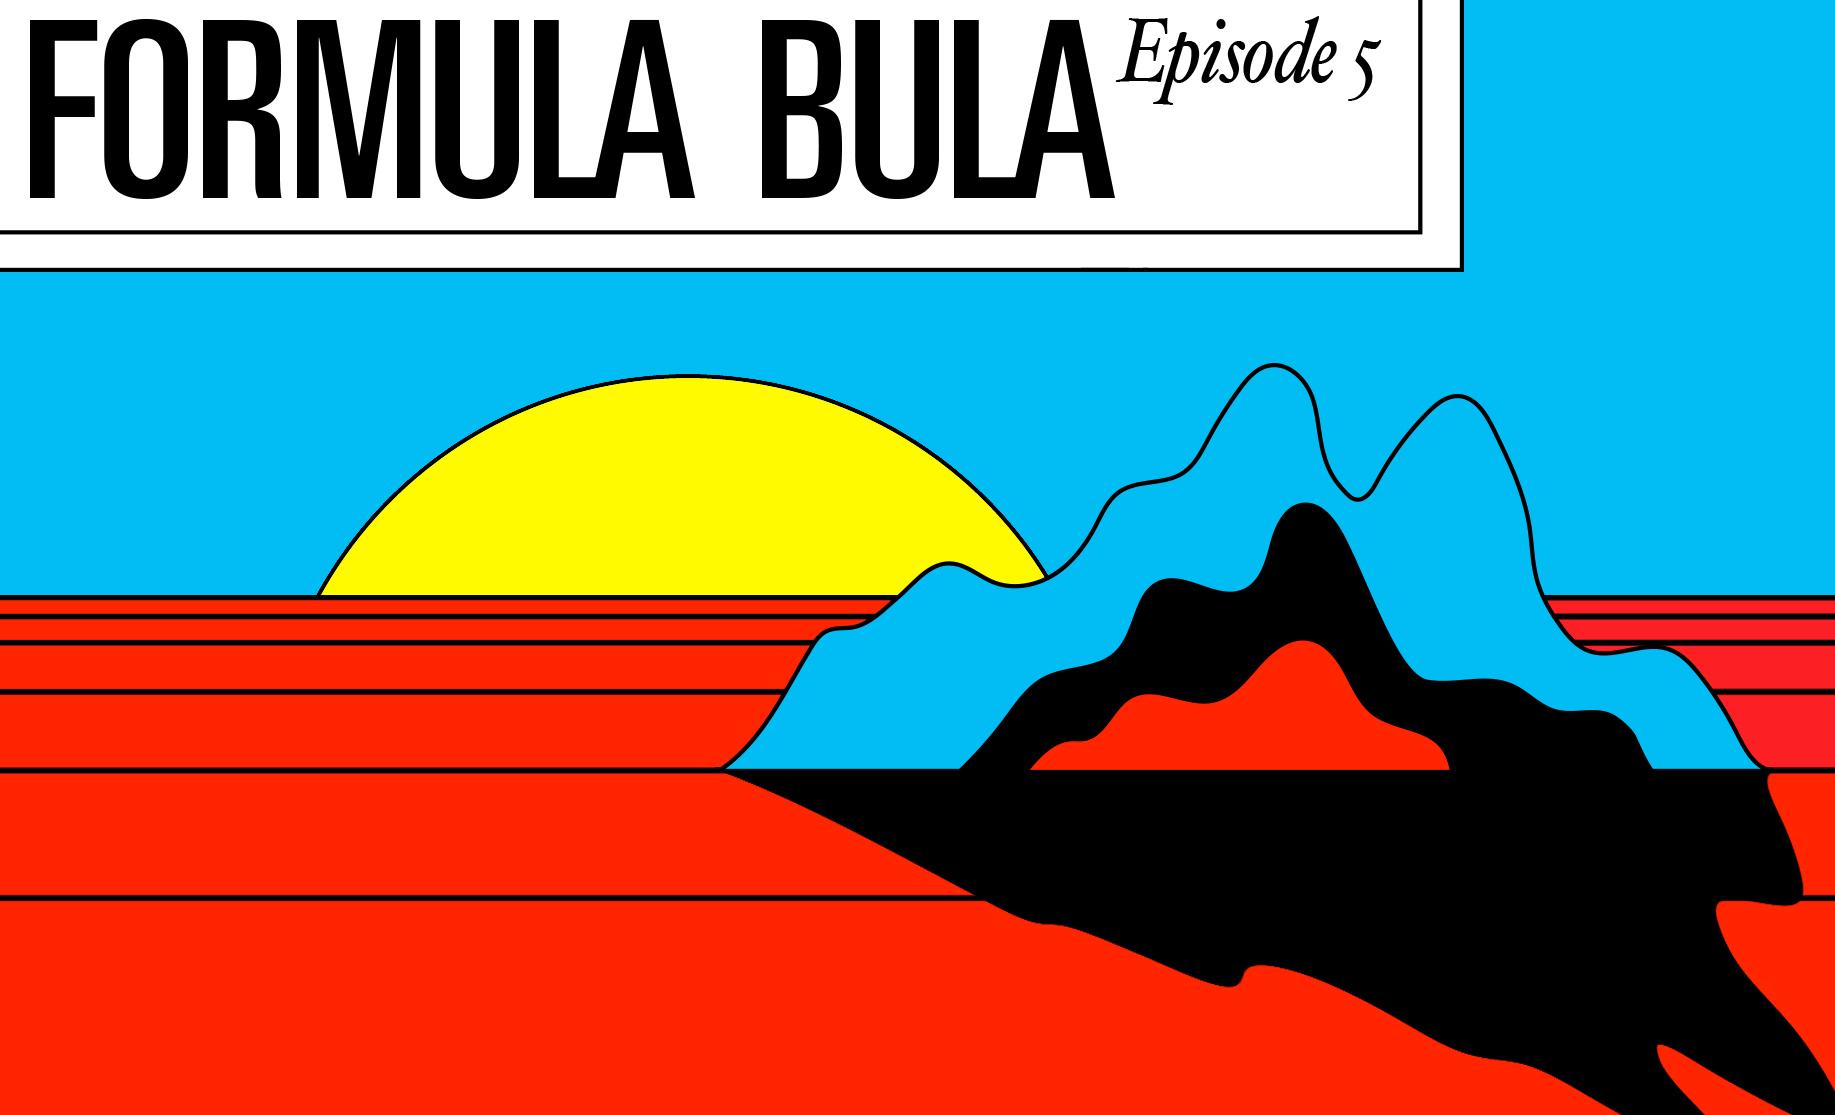 FORMULA BULA 2017